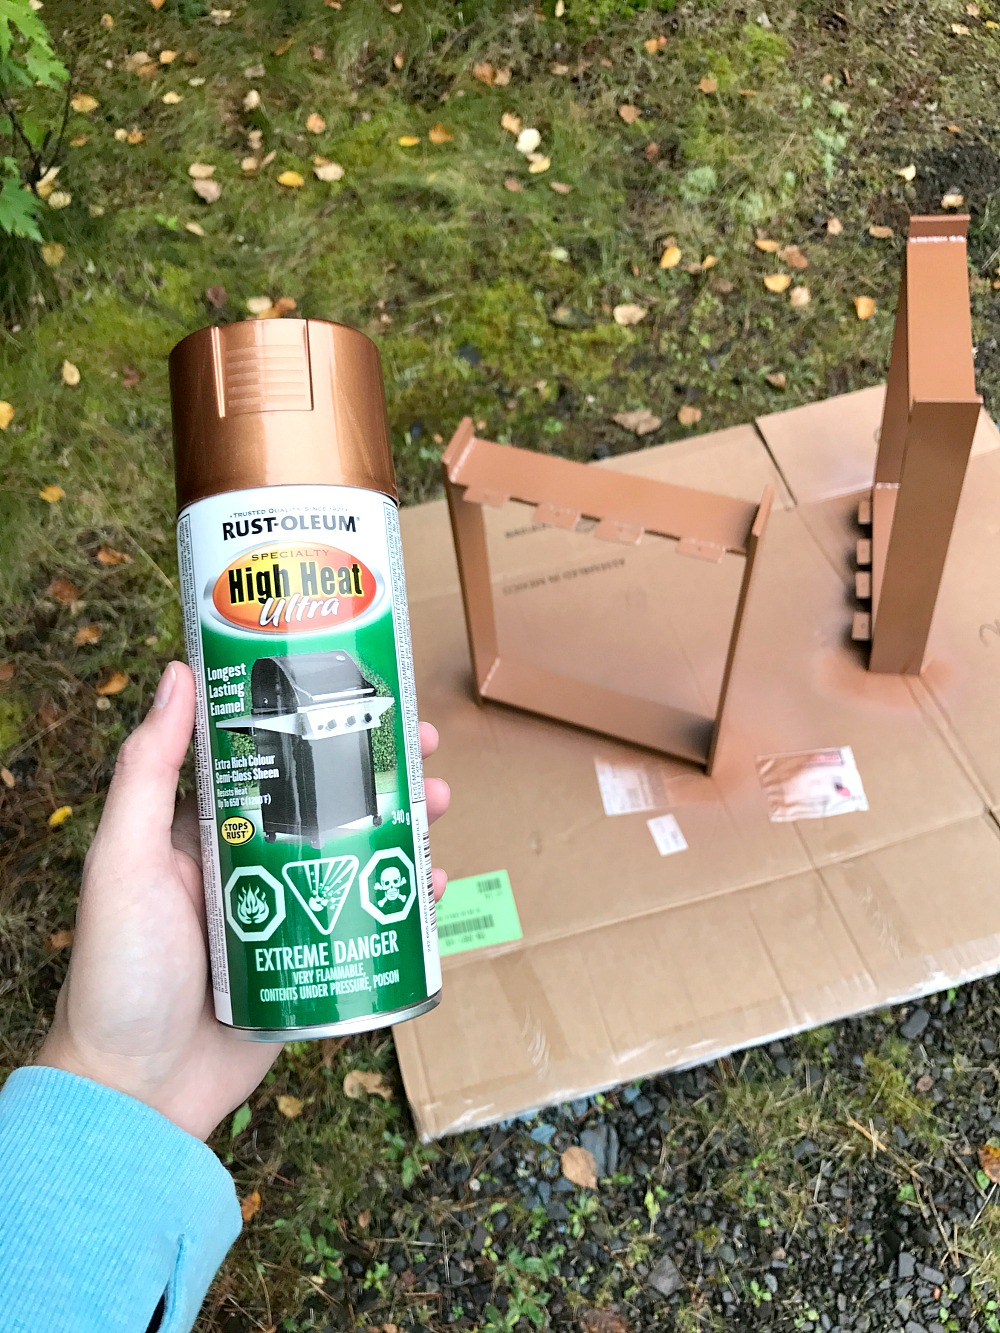 Rust-Oleum High Heat Copper Paint